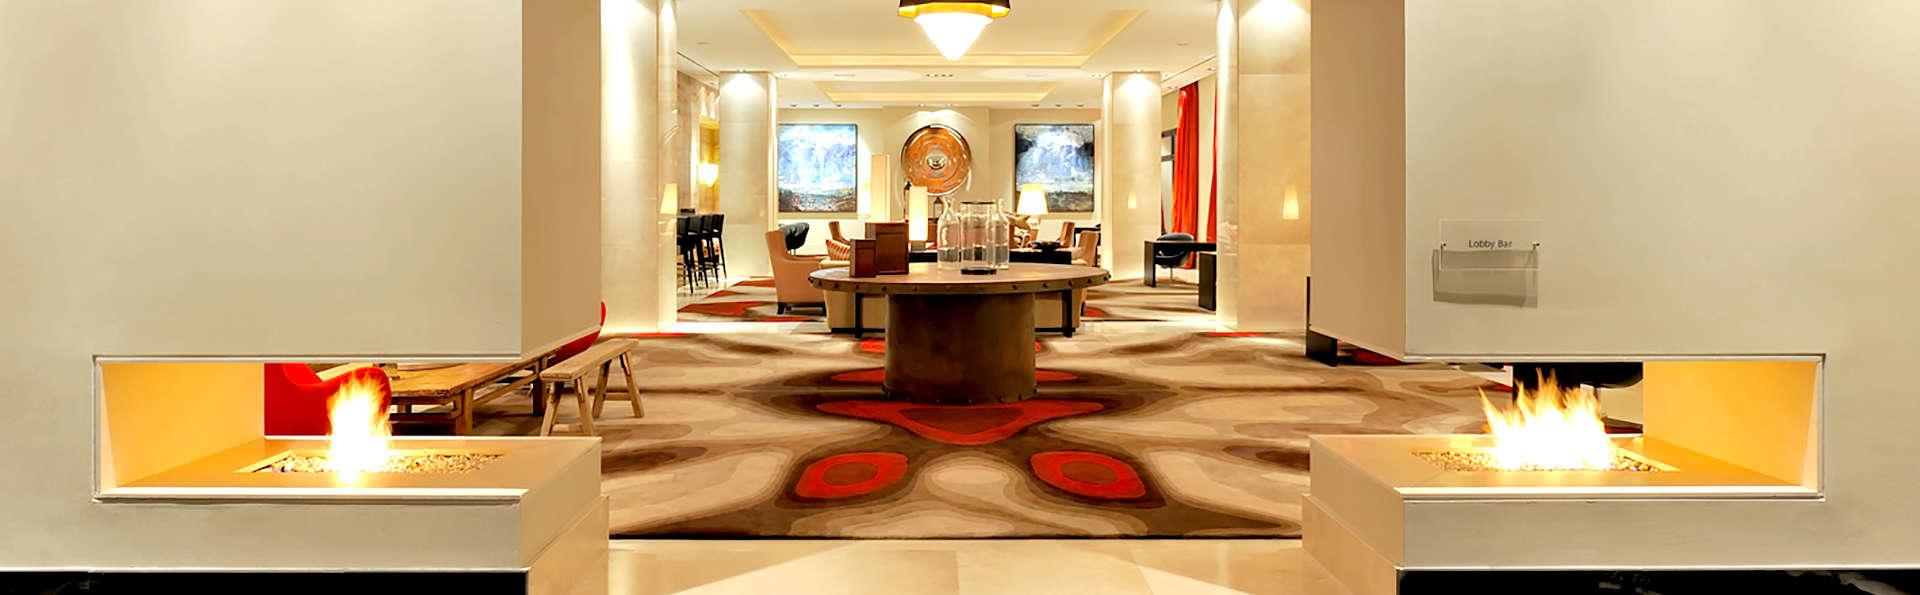 URH Hotel SPA Zen Balagares - EDIT_NEW_LOUNGE3.jpg